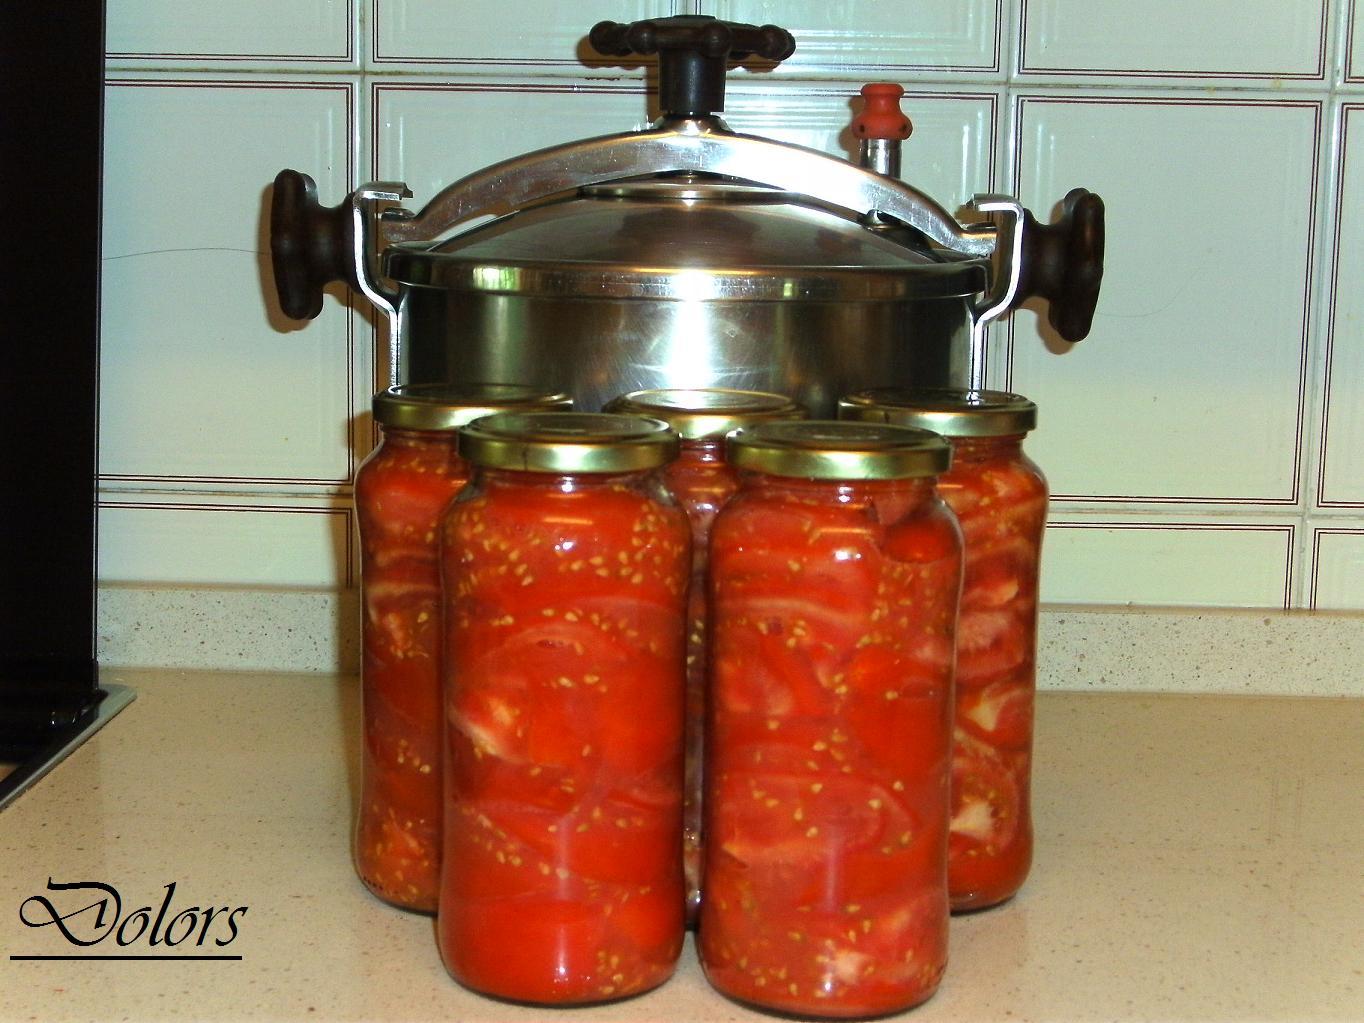 Cocinar Olla Express | Cocina Y Mas Cosas Conserva De Tomates En Olla A Presion